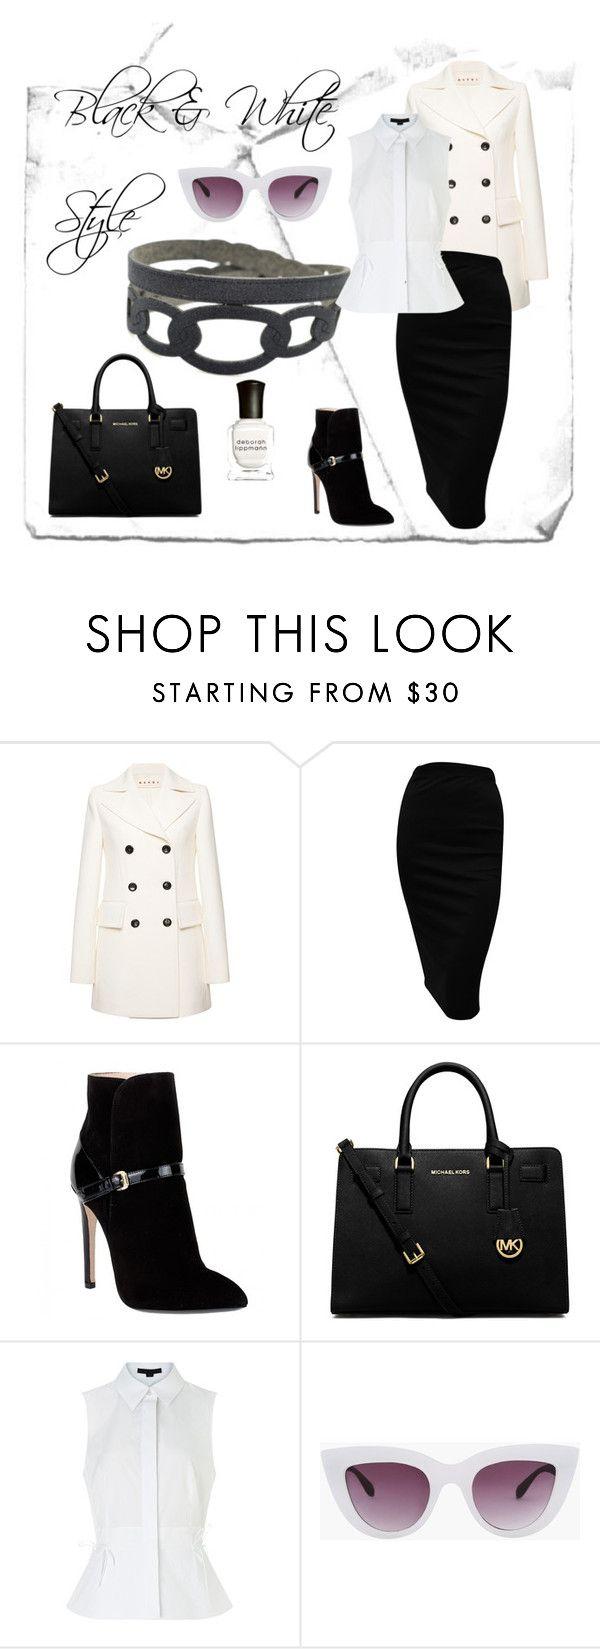 Black & White Style by krilajewels on Polyvore featuring moda, Alexander Wang, Marni, Emilio Pucci, MICHAEL Michael Kors and Deborah Lippmann